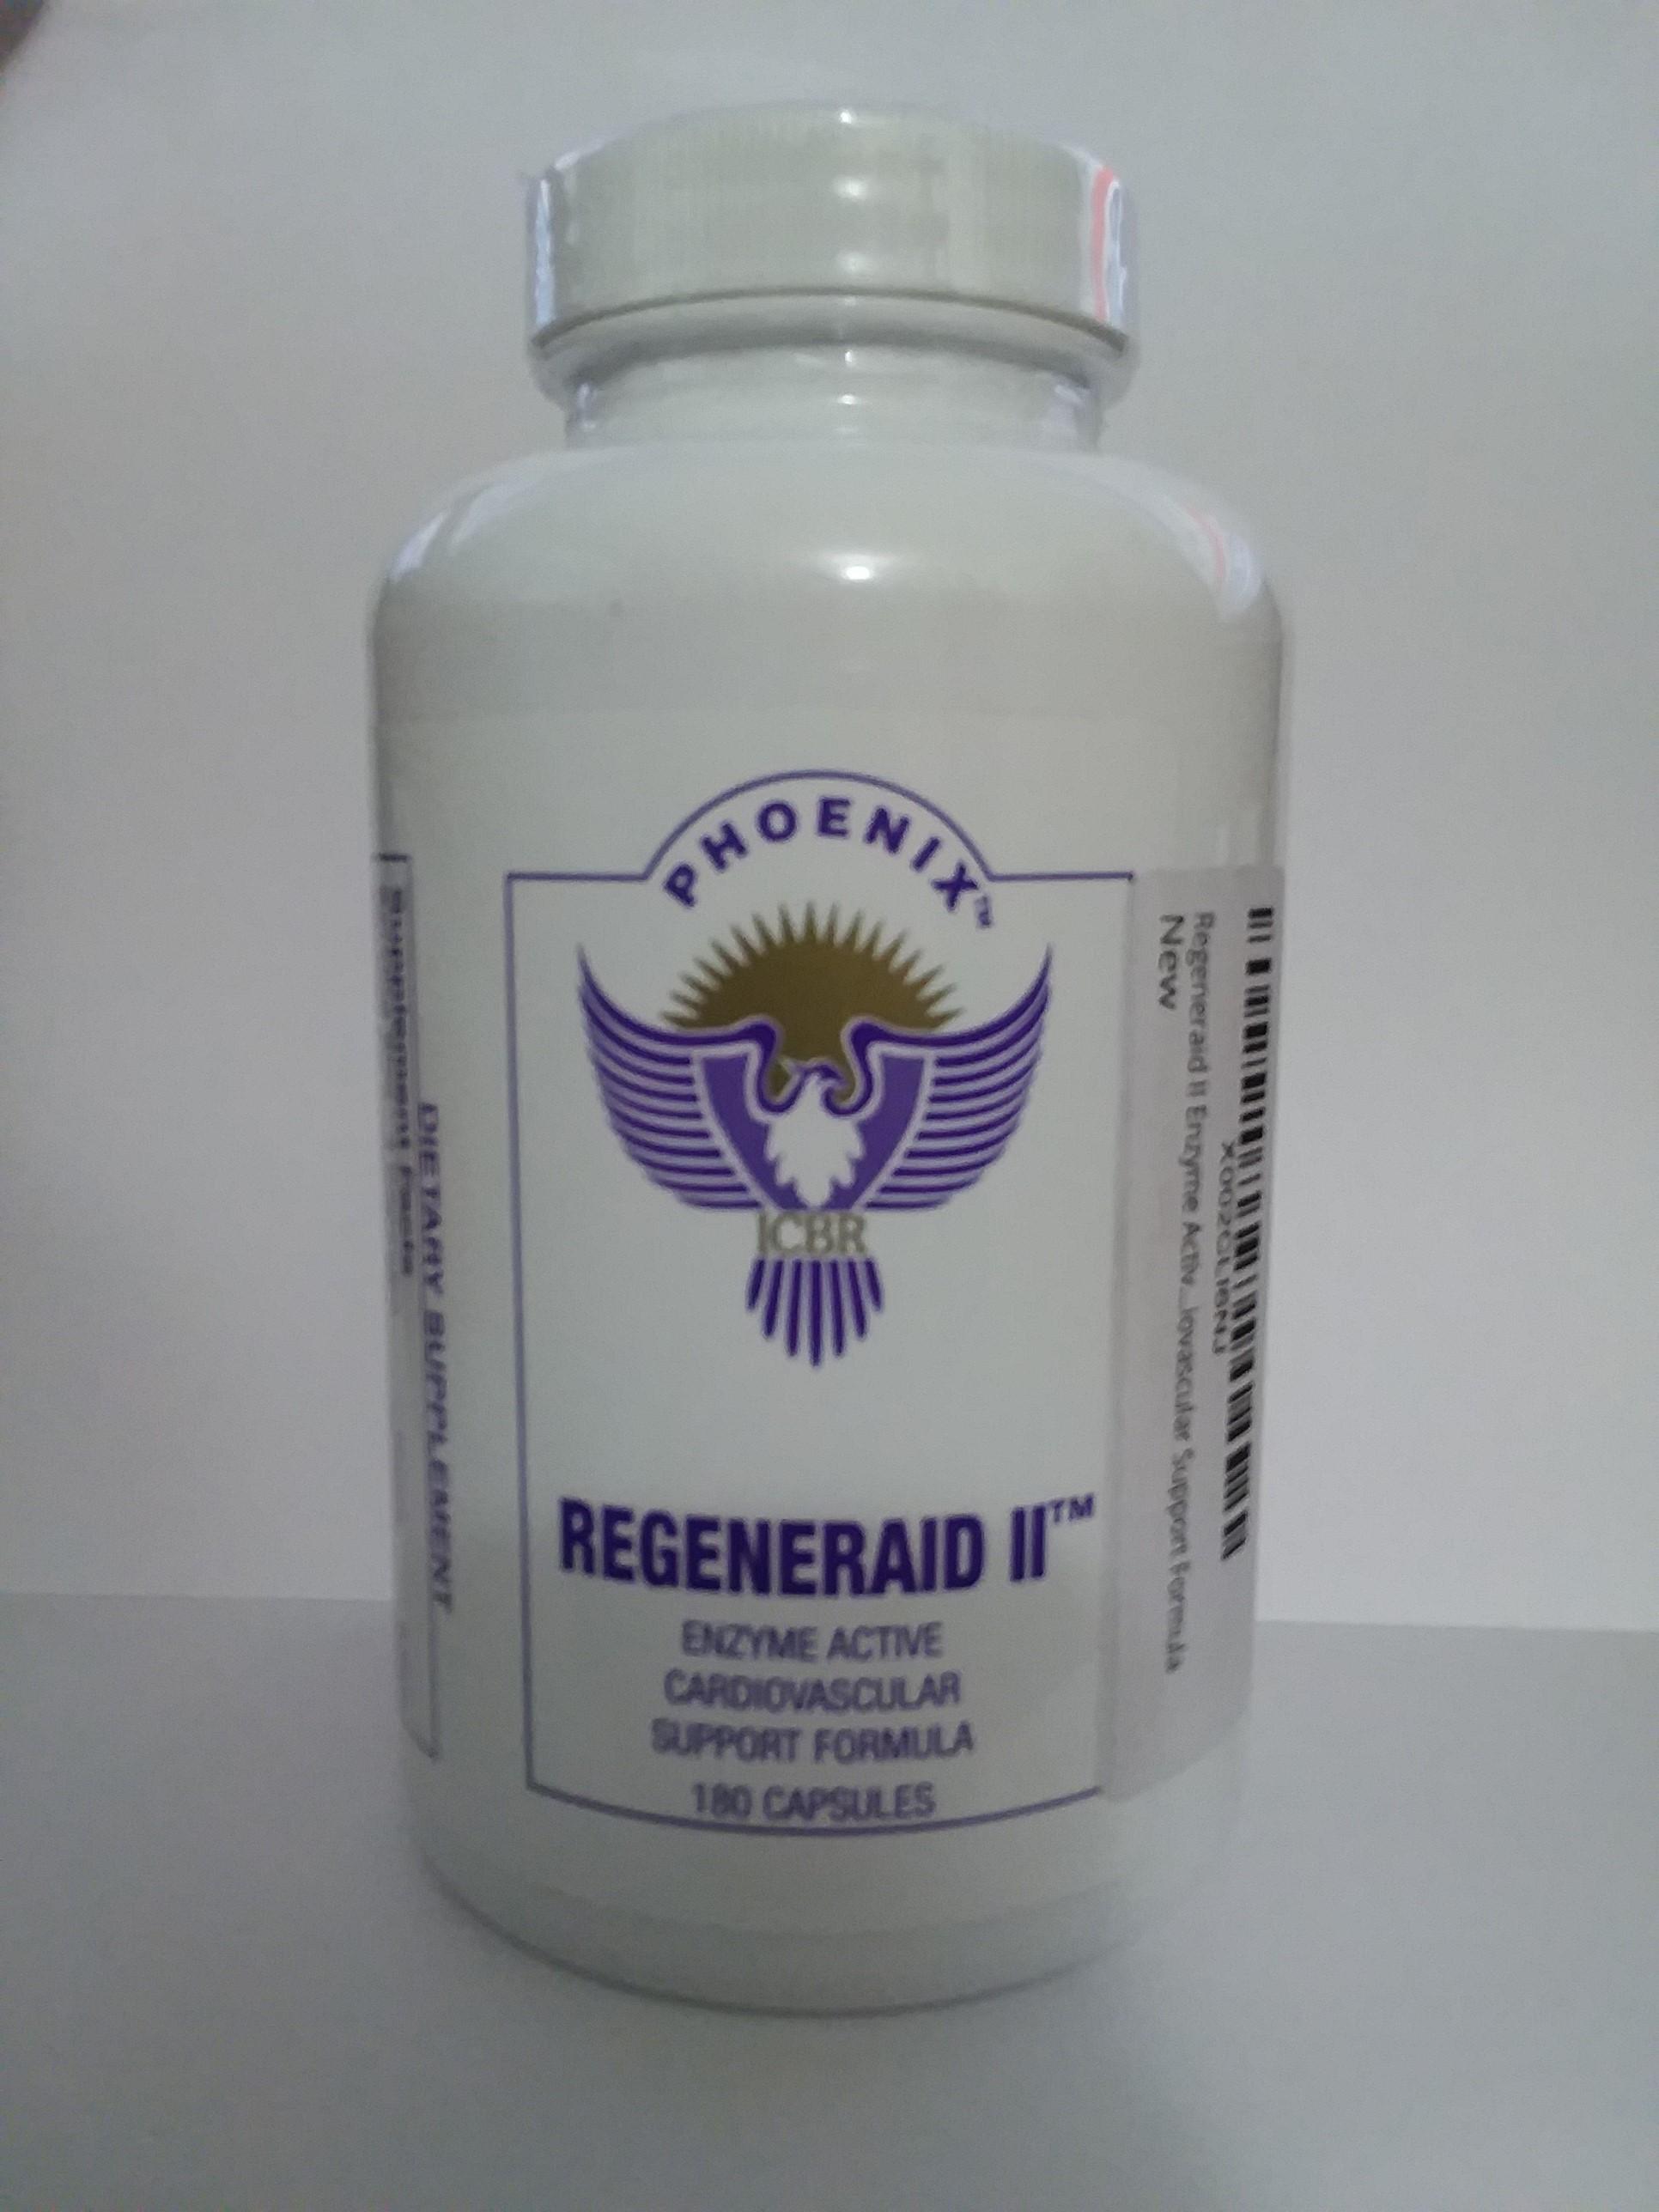 Regeneraid II